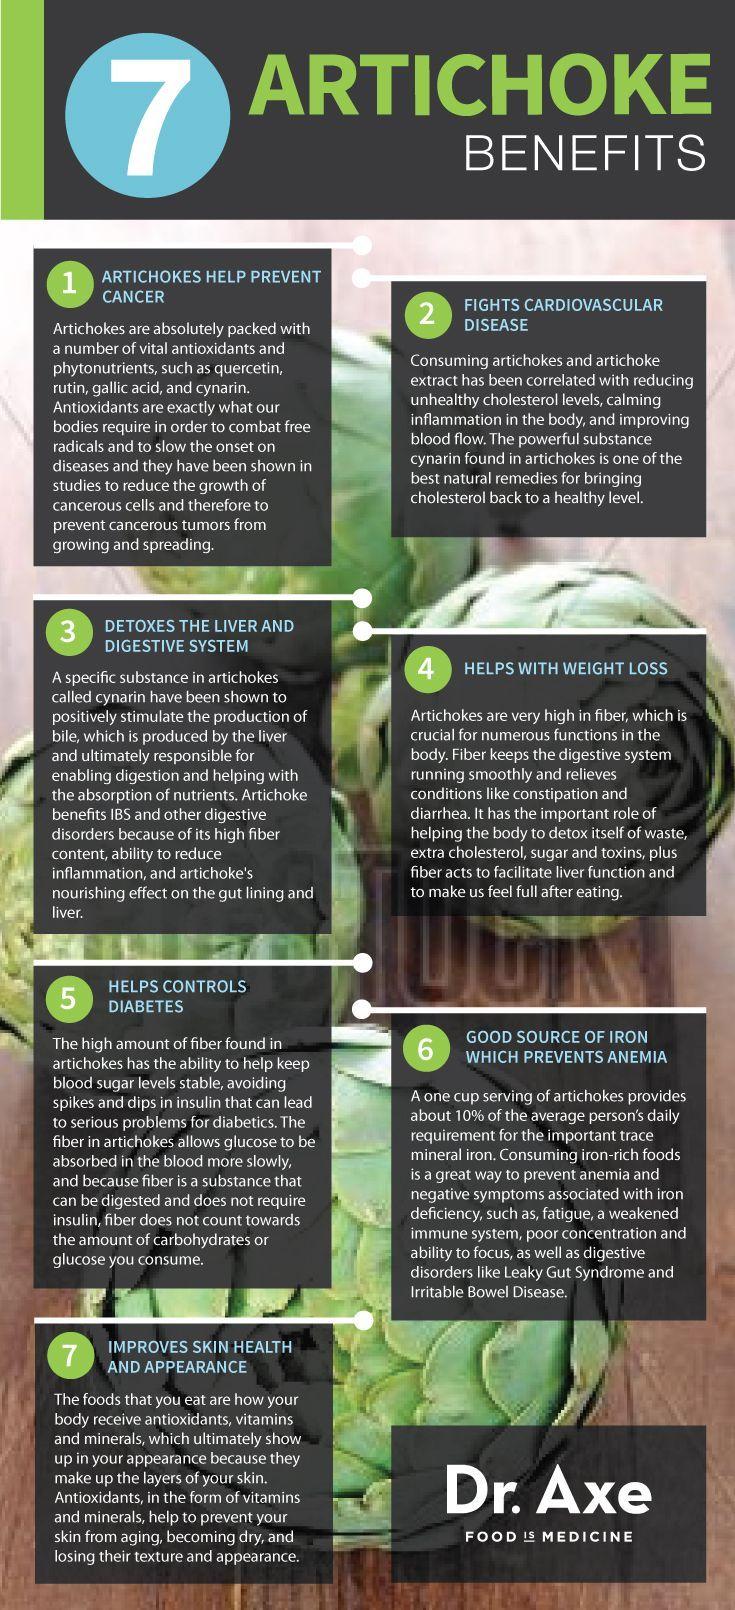 Artichoke Benefits, Recipes & Nutrition Facts